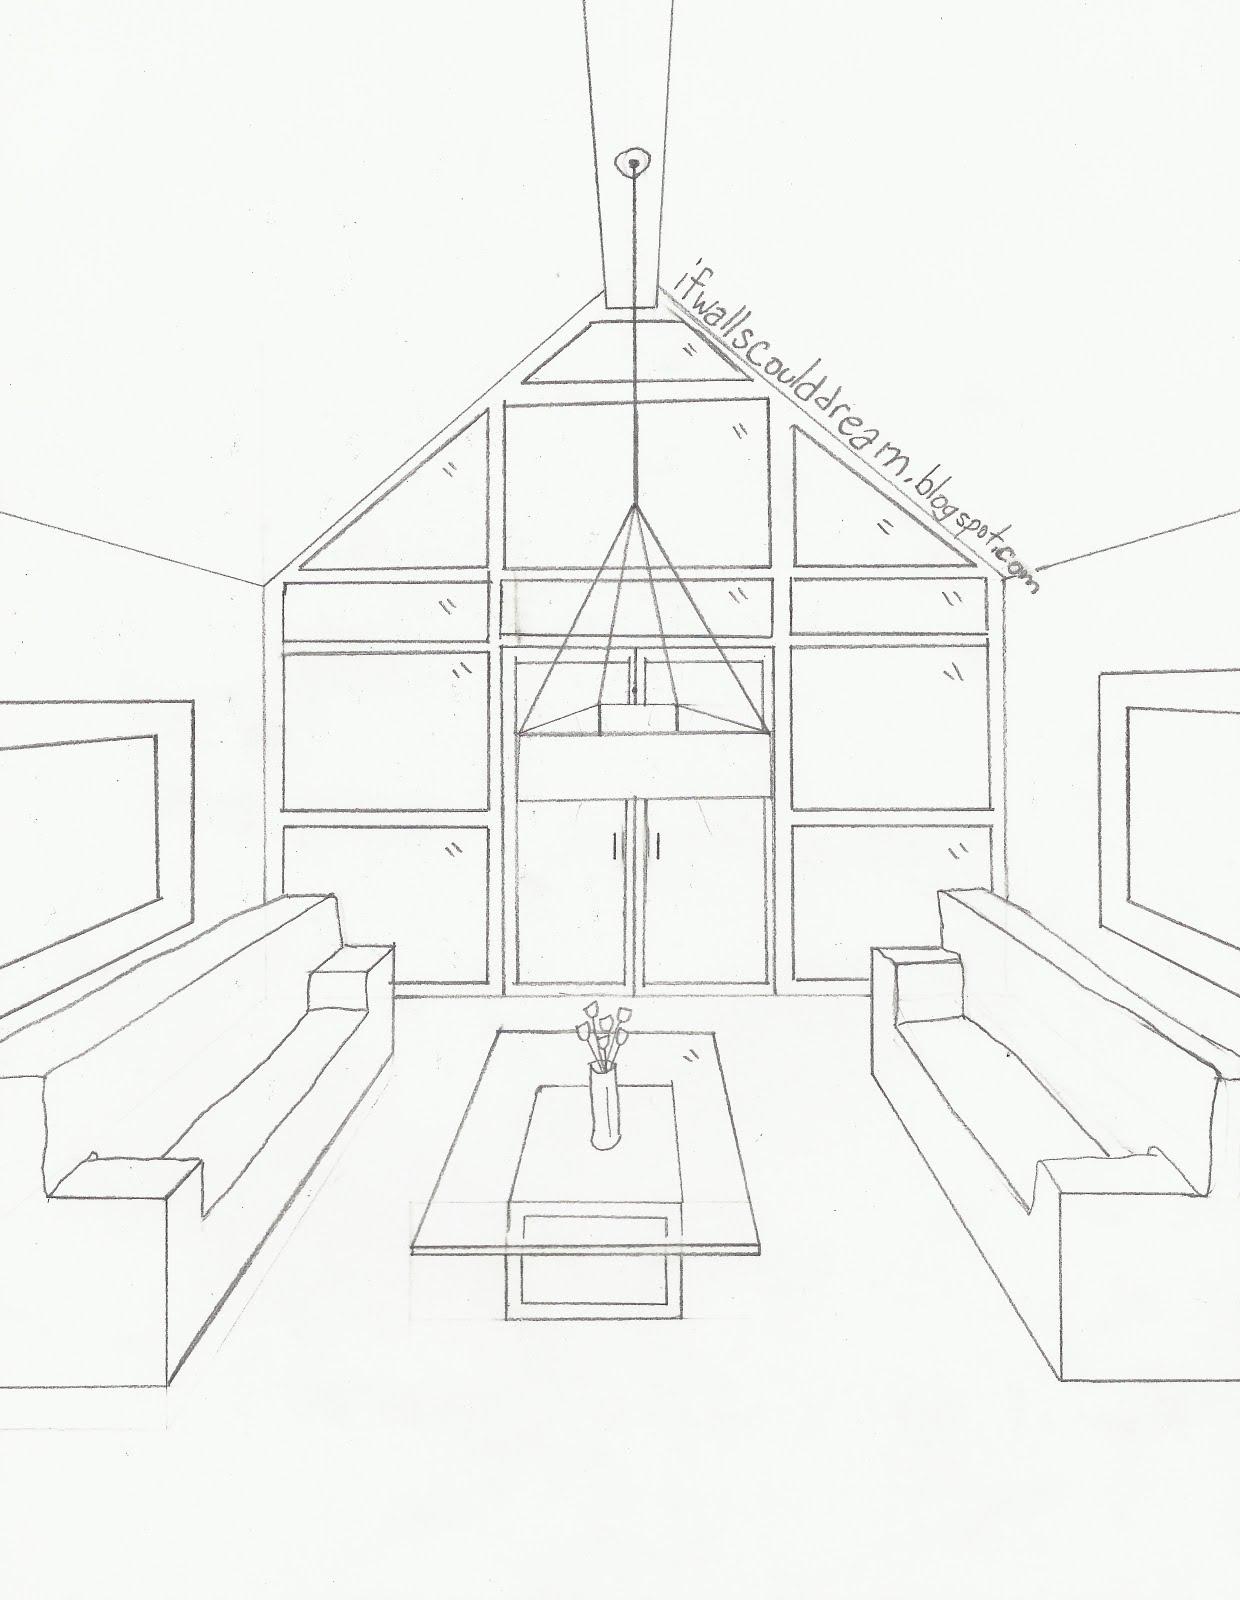 Living Room Sketch: Simple Line Drawing Of House At GetDrawings